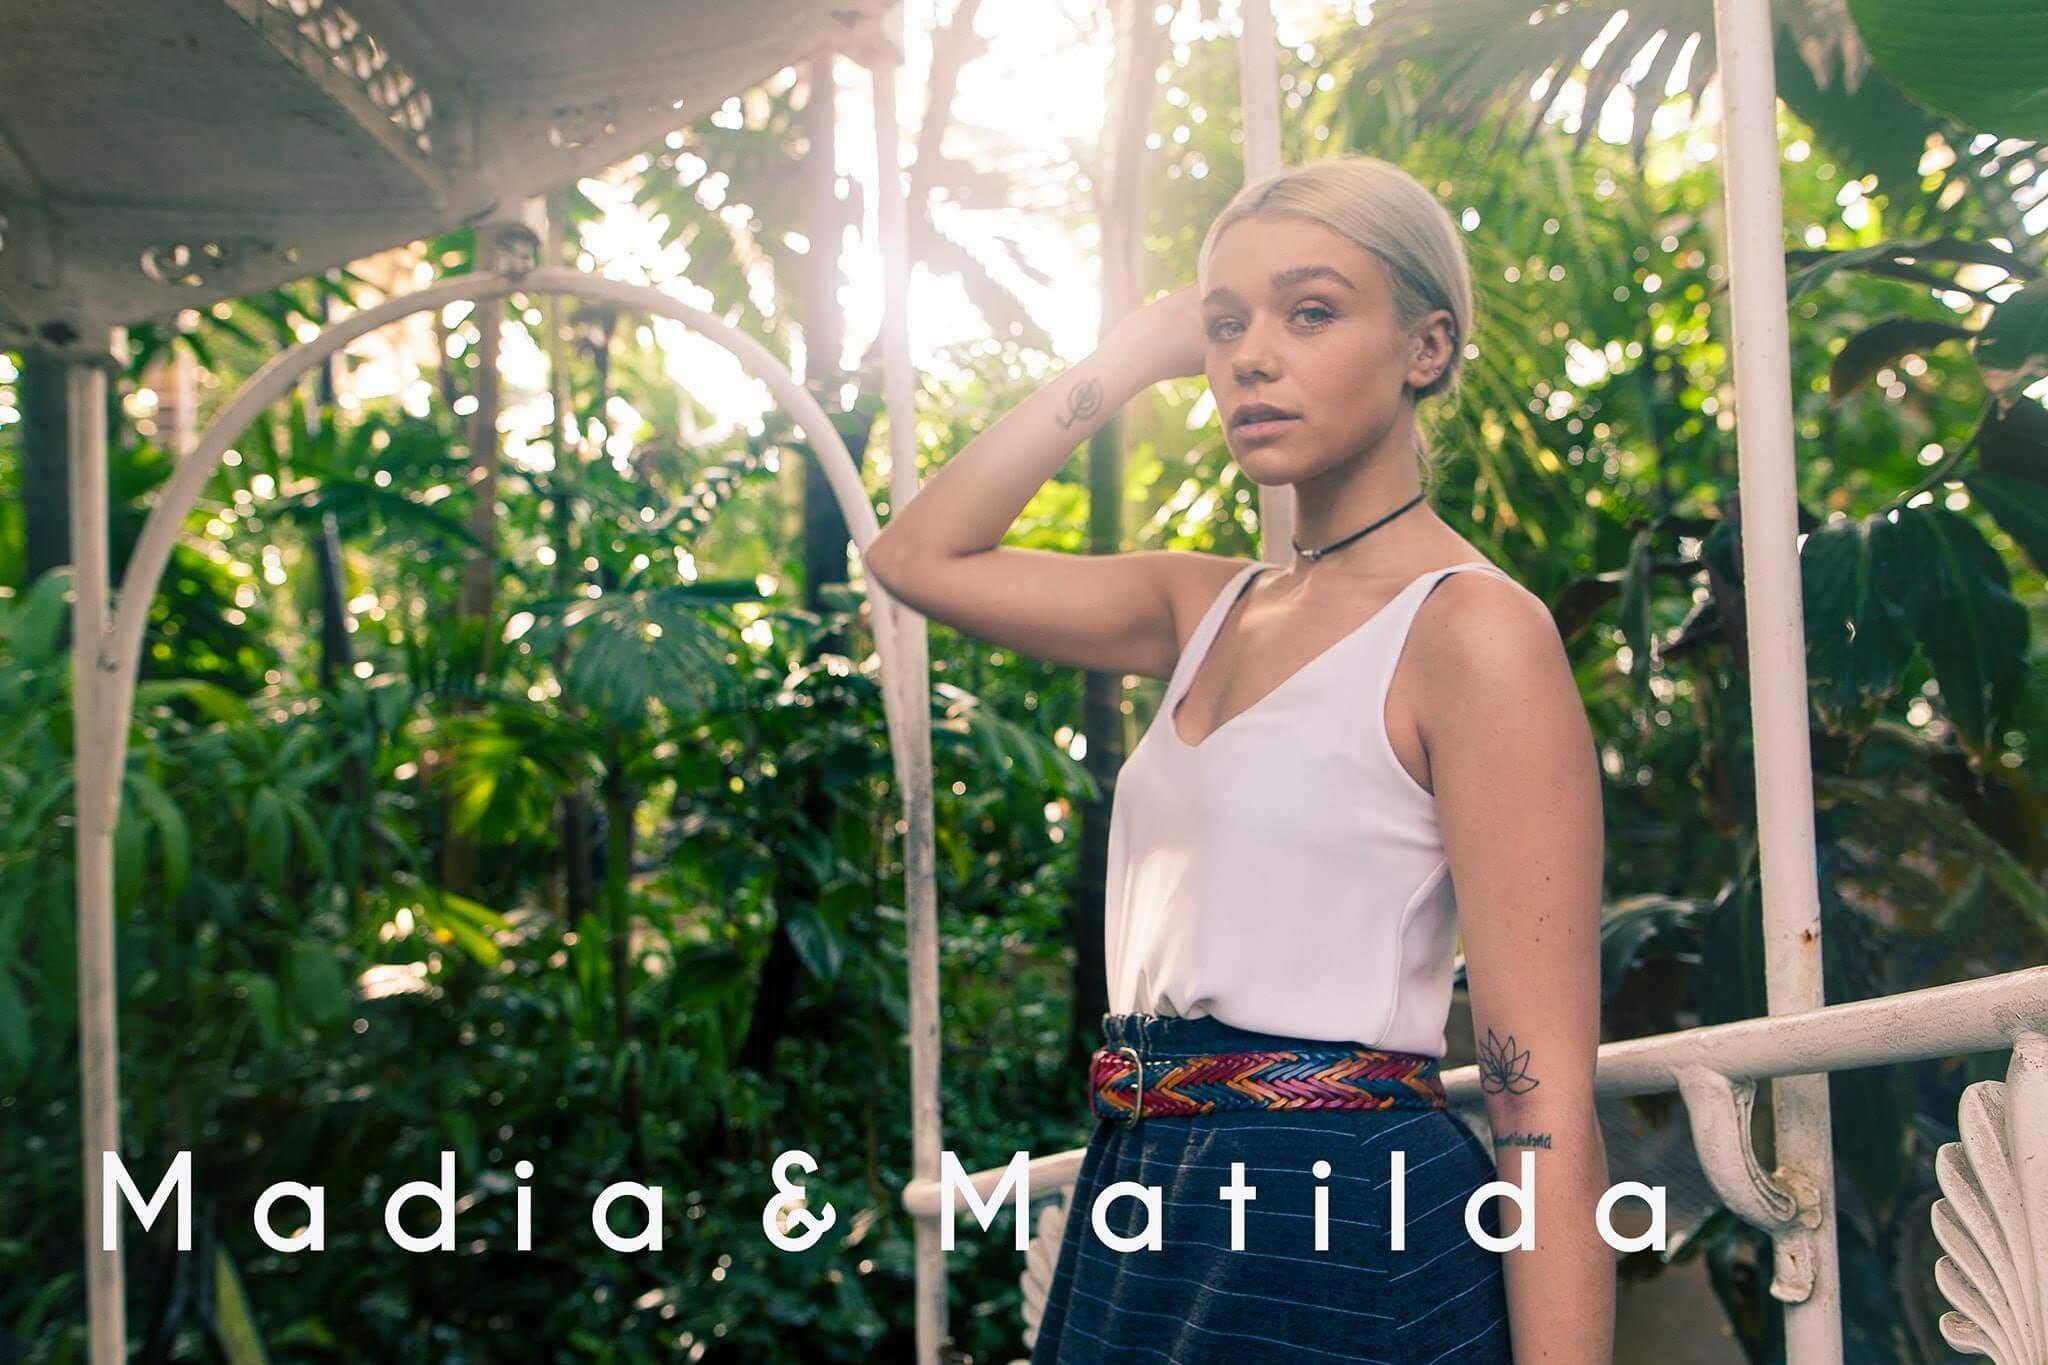 madia-matilda-brand